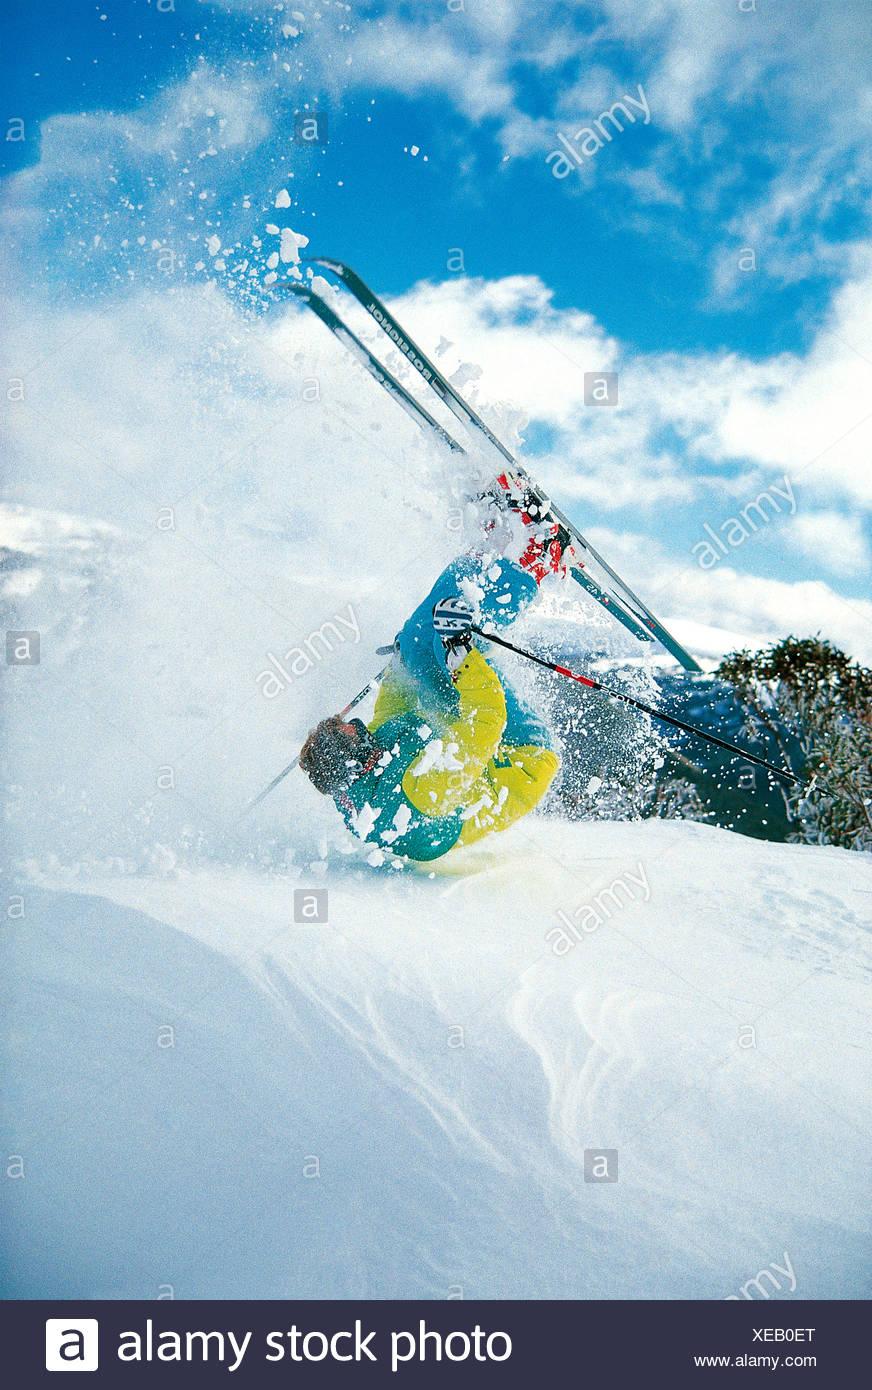 Man snow skiing. Somersaulting. Australia. Stock Photo